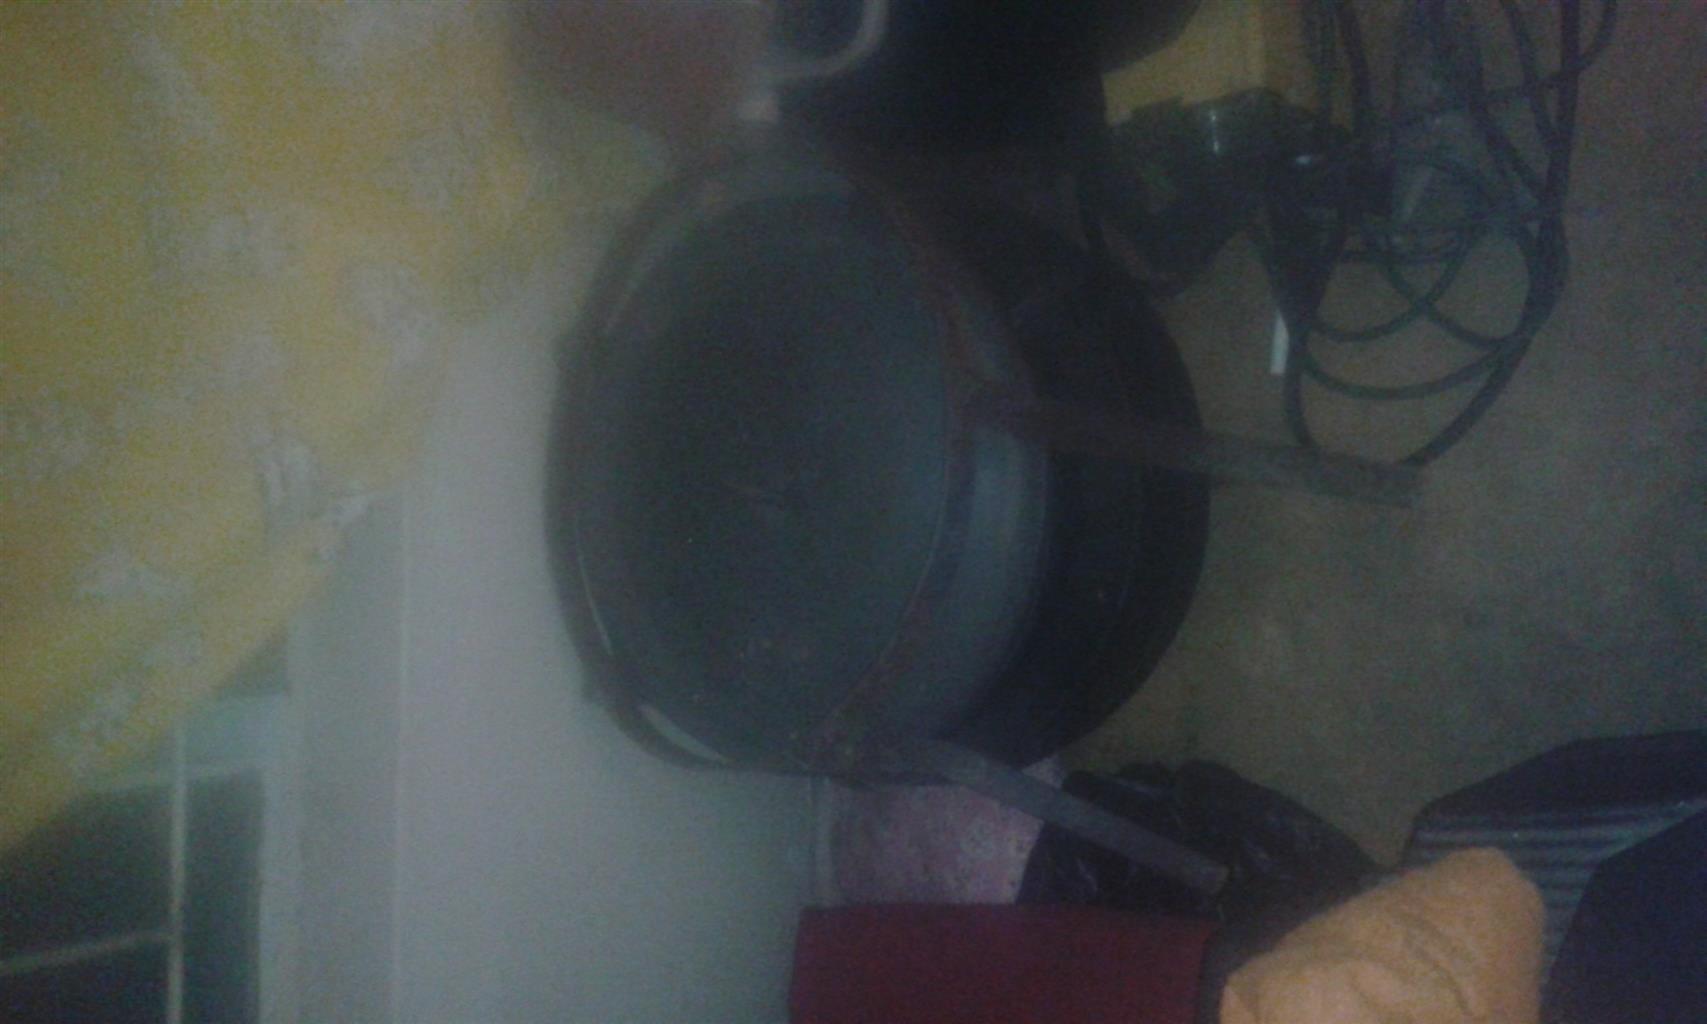 Black cooking pot